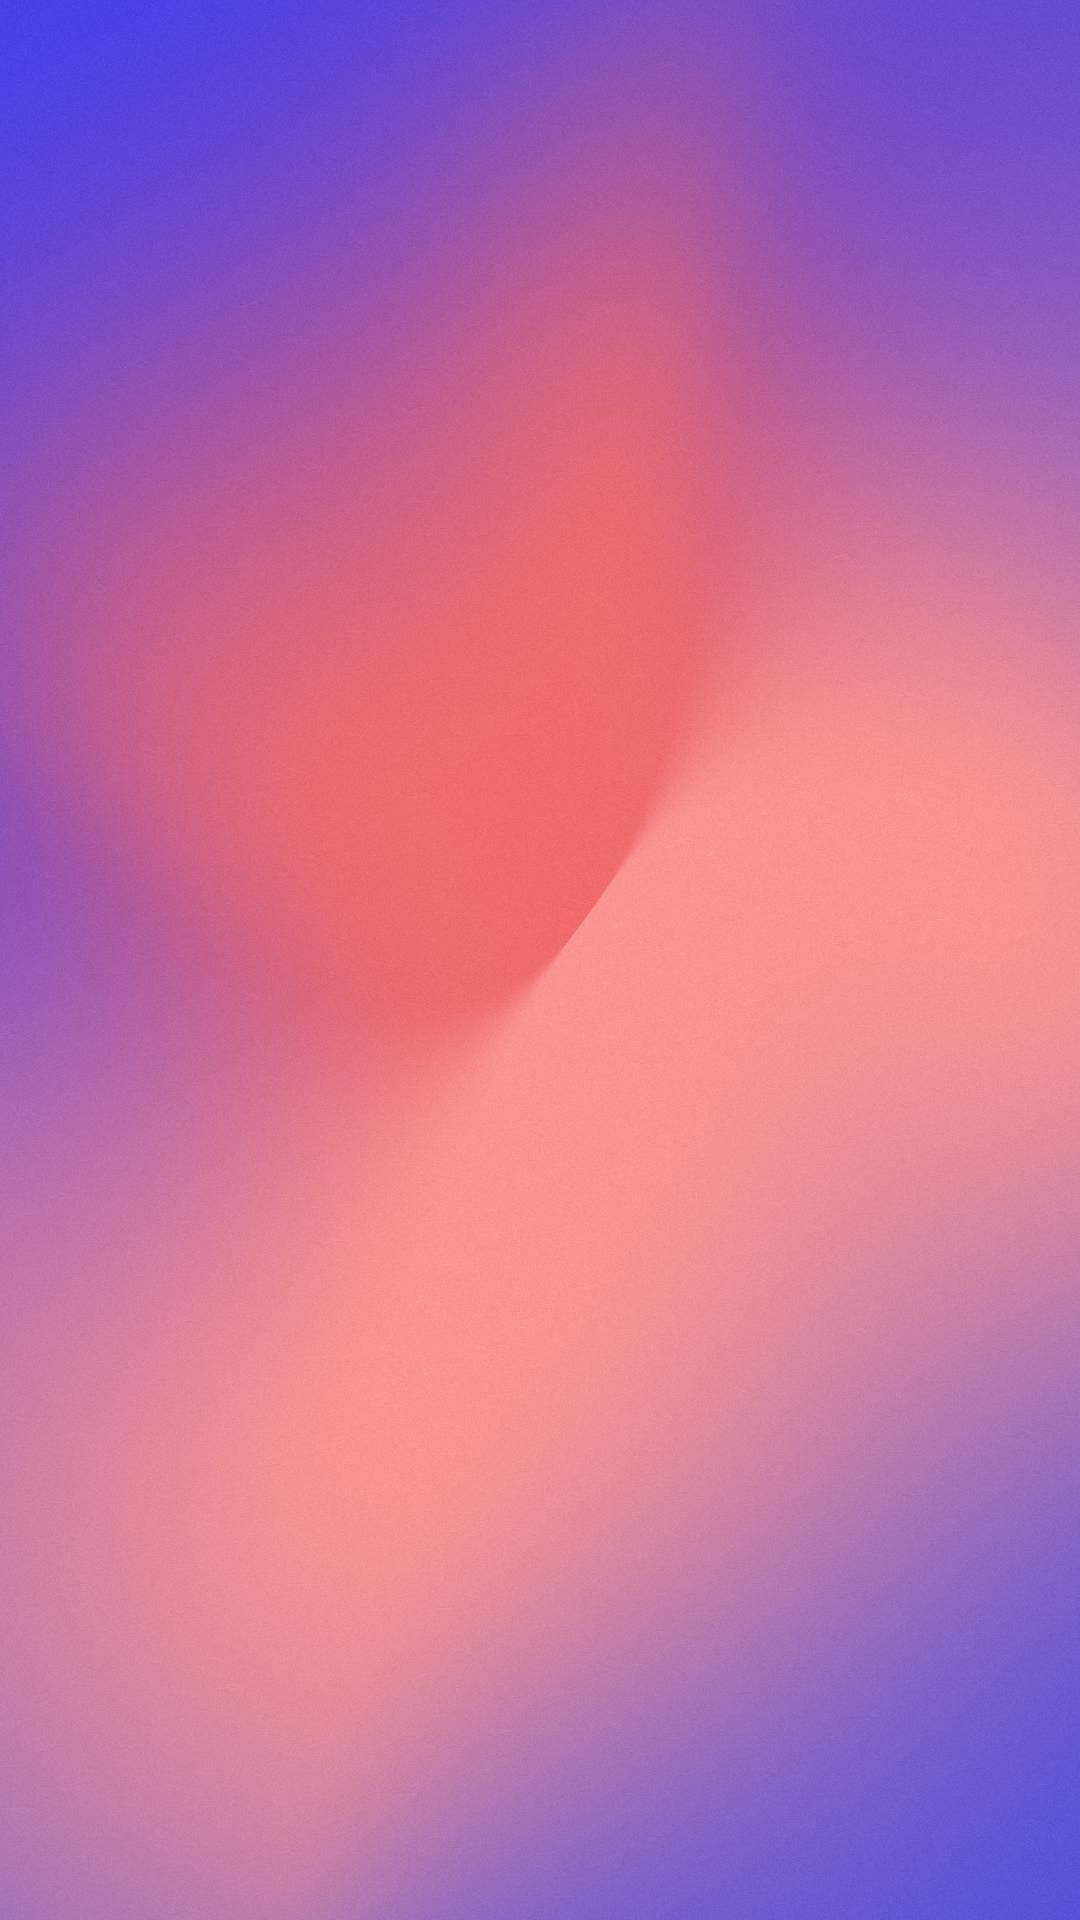 Pixel 3 Stock Wallpapers & Live Wallpapers - Download ...